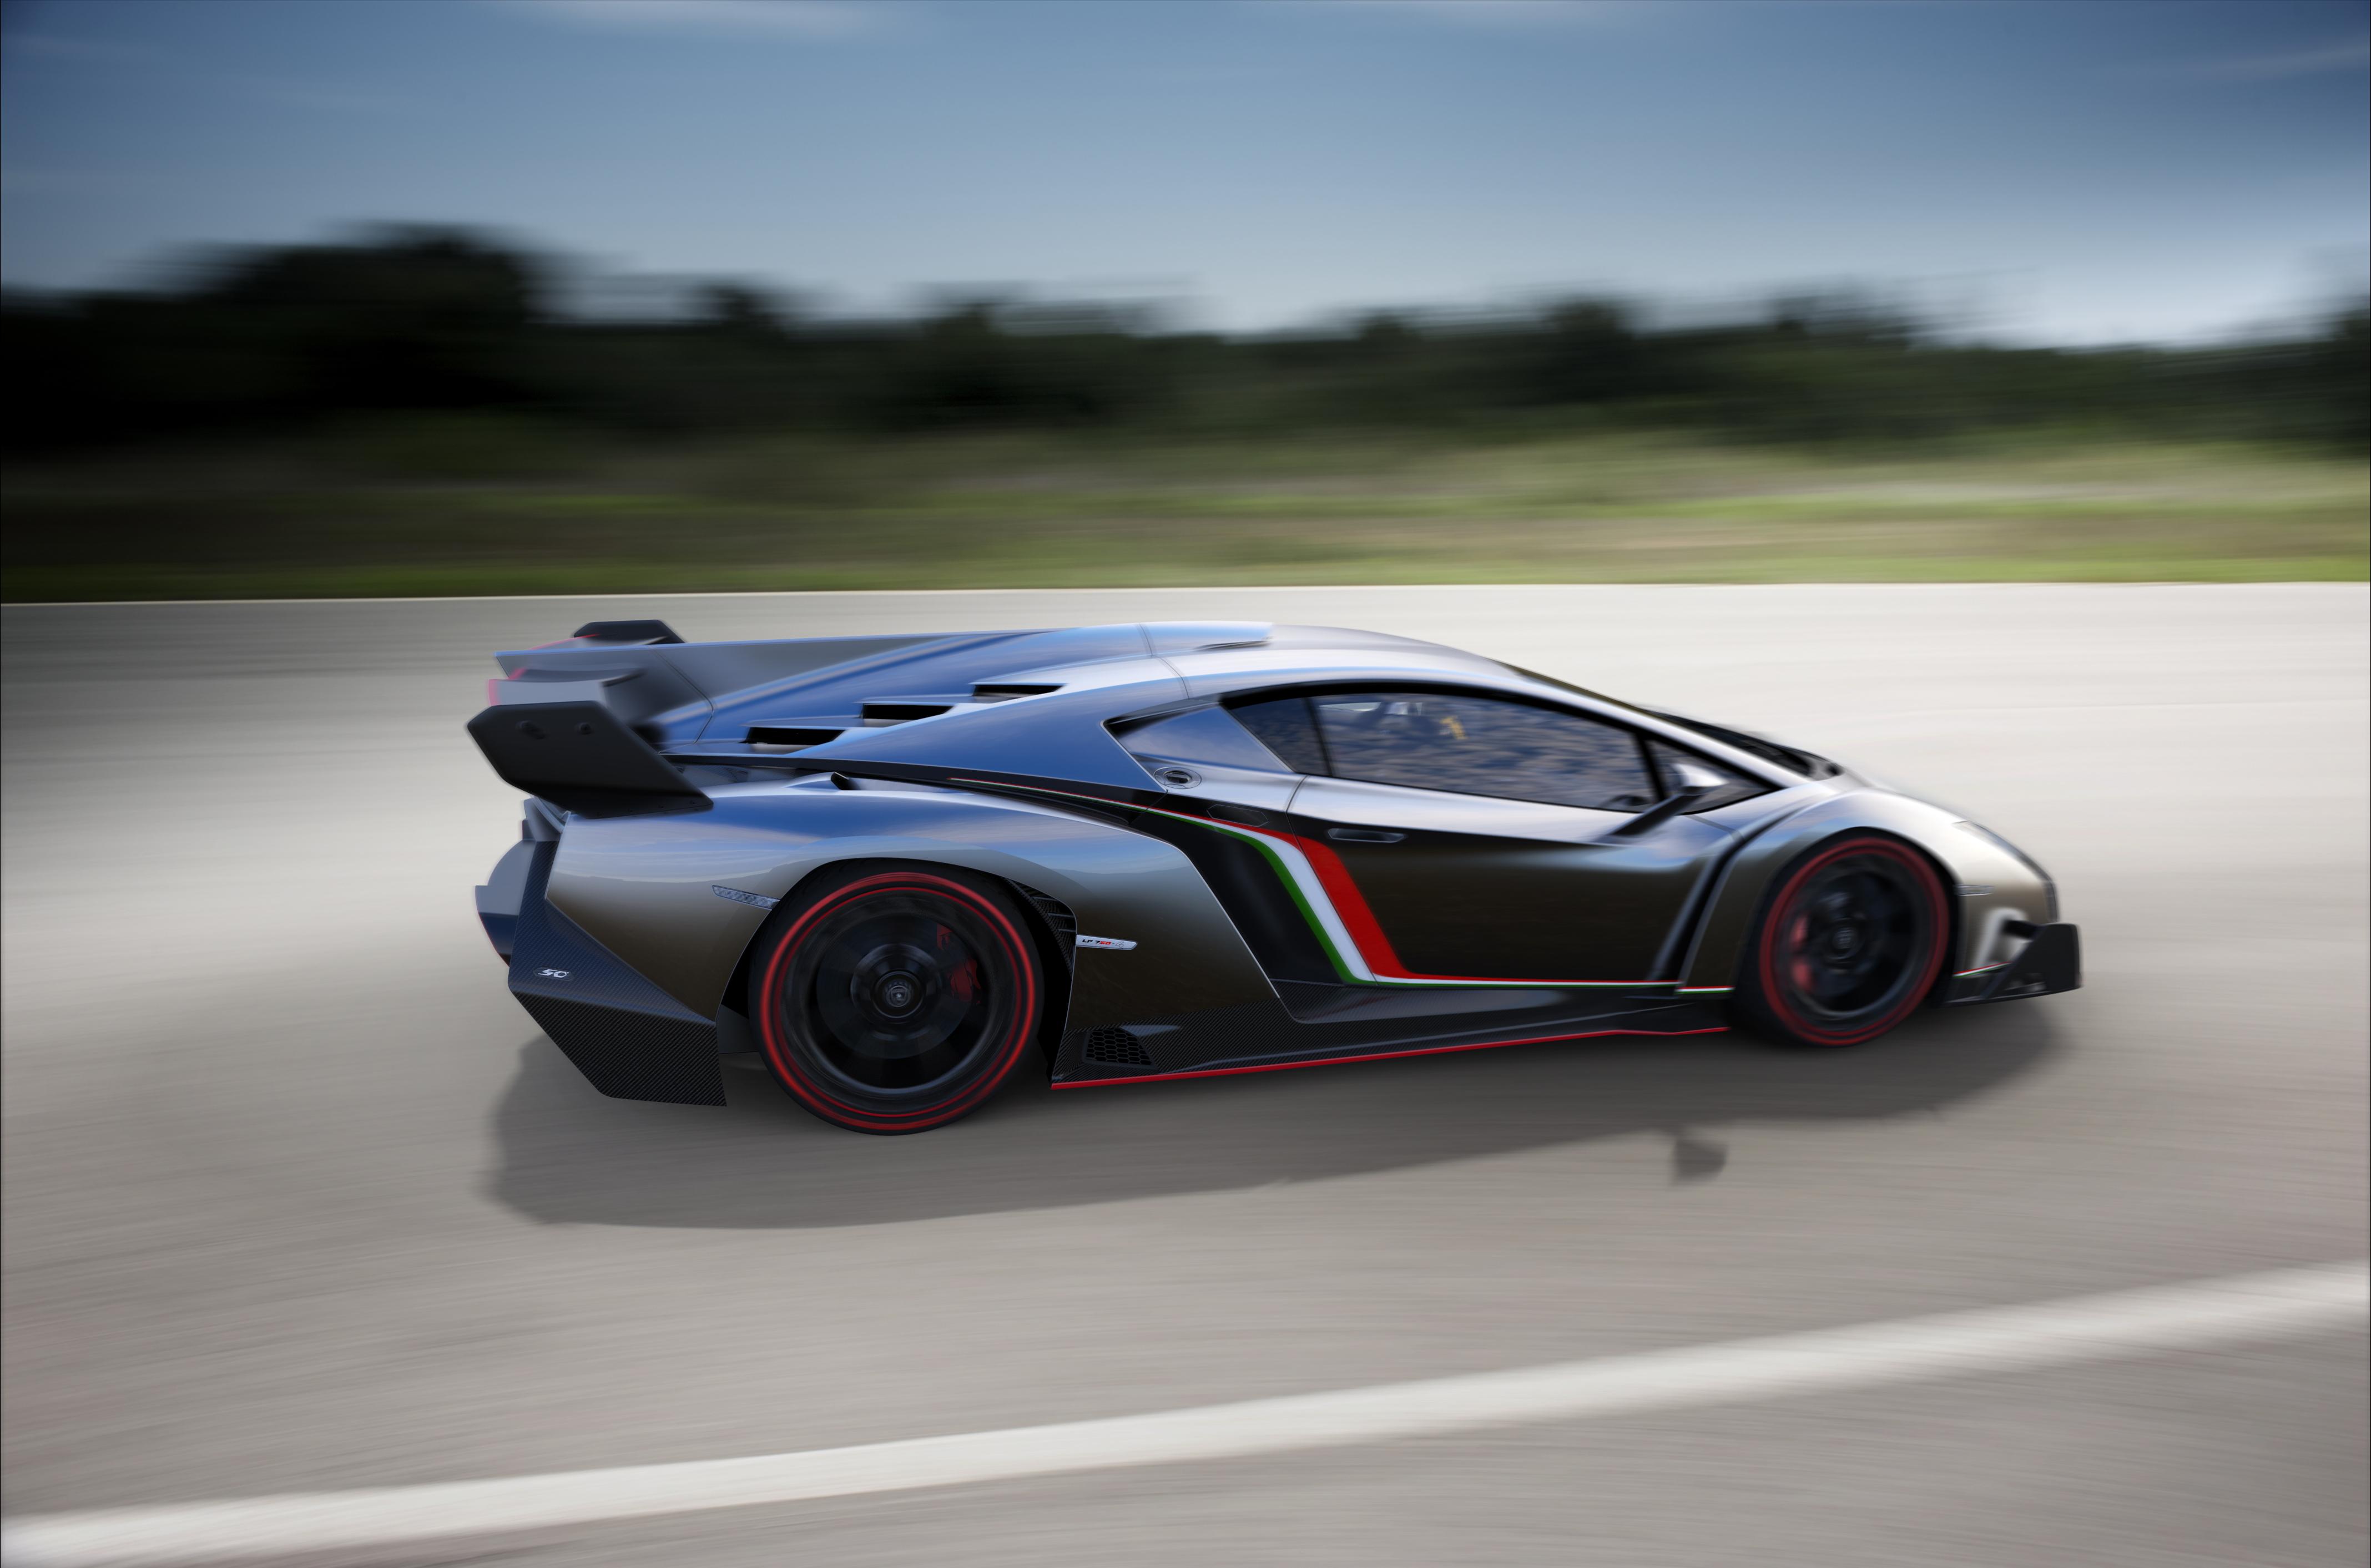 480x854 Lamborghini Veneno 5k Android One Hd 4k Wallpapers Images